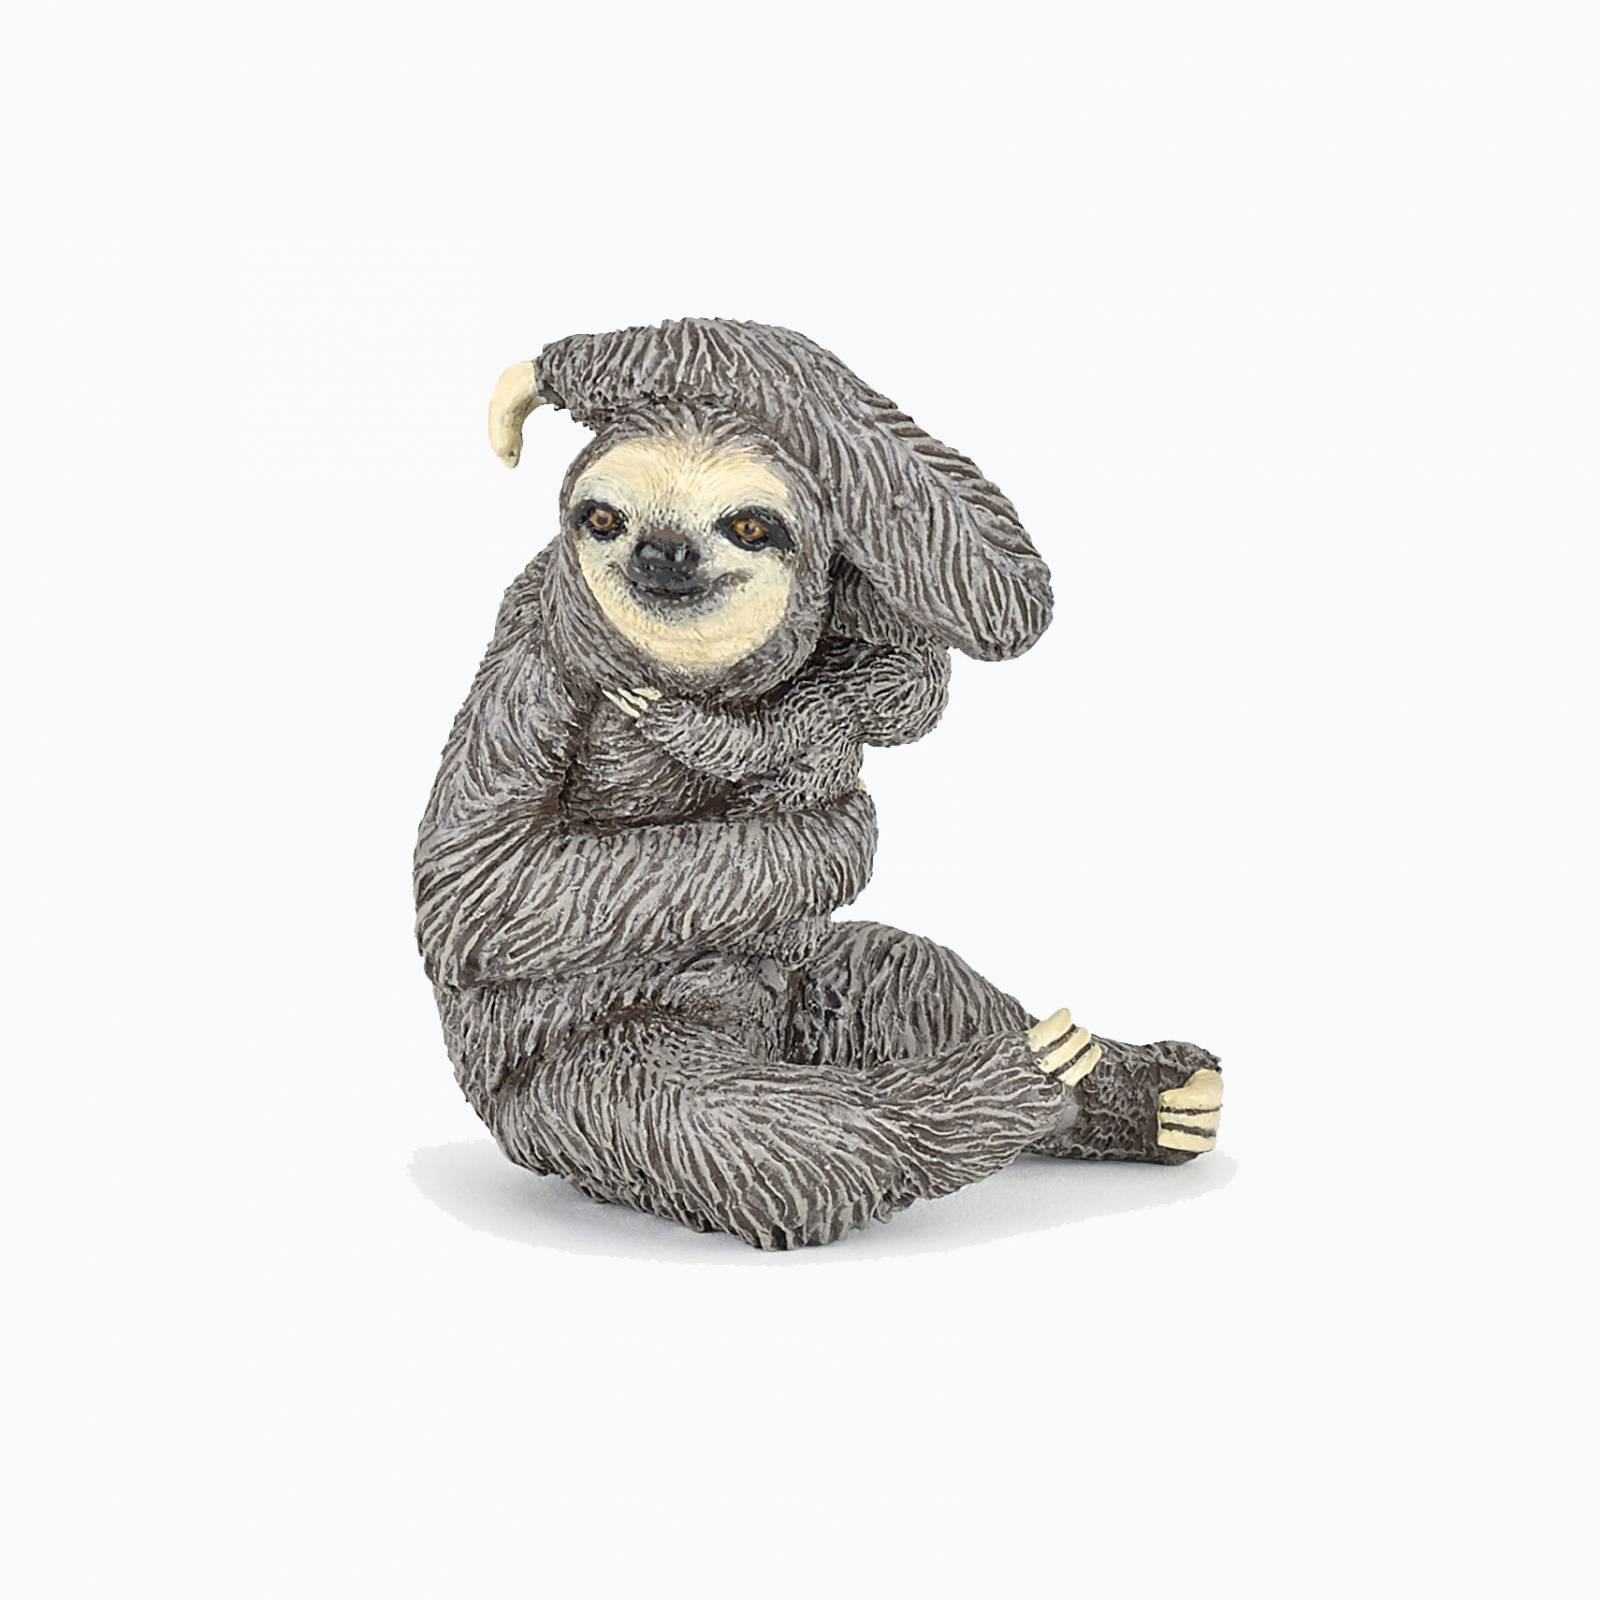 Sloth - Papo Wild Animal Figure